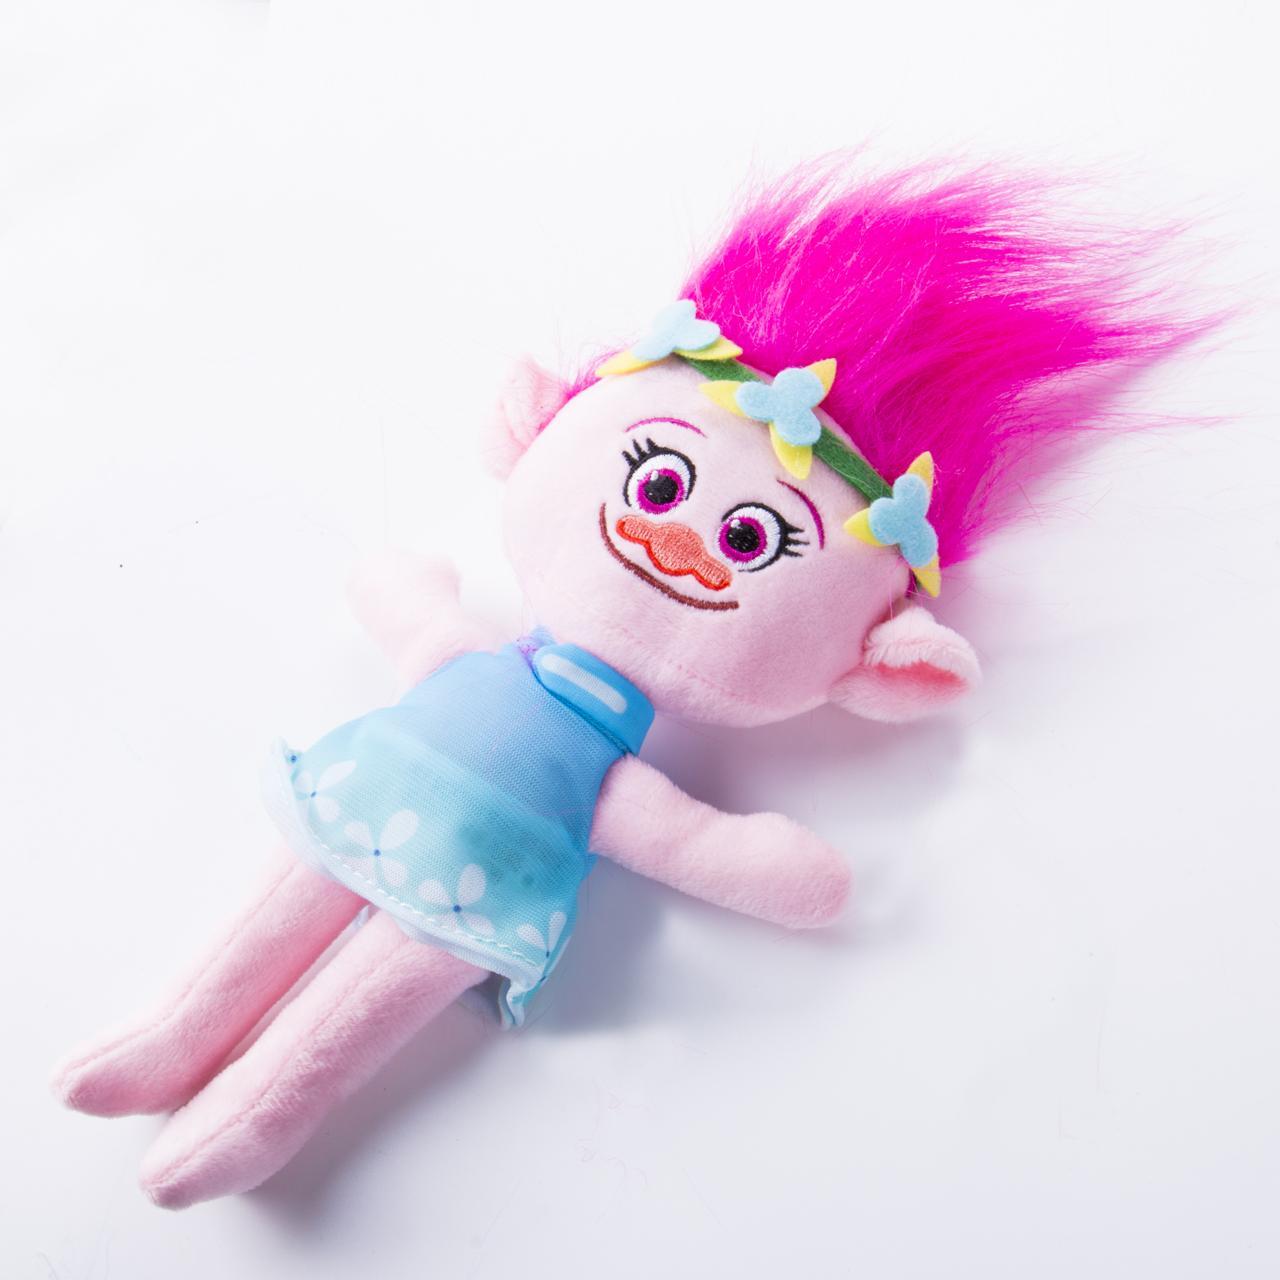 2021 New Movie Trolls Large Poppy Branch Hug Plush Doll Kids Gifts Cute Toys 23cm From Gl8888 5 02 Dhgate Com